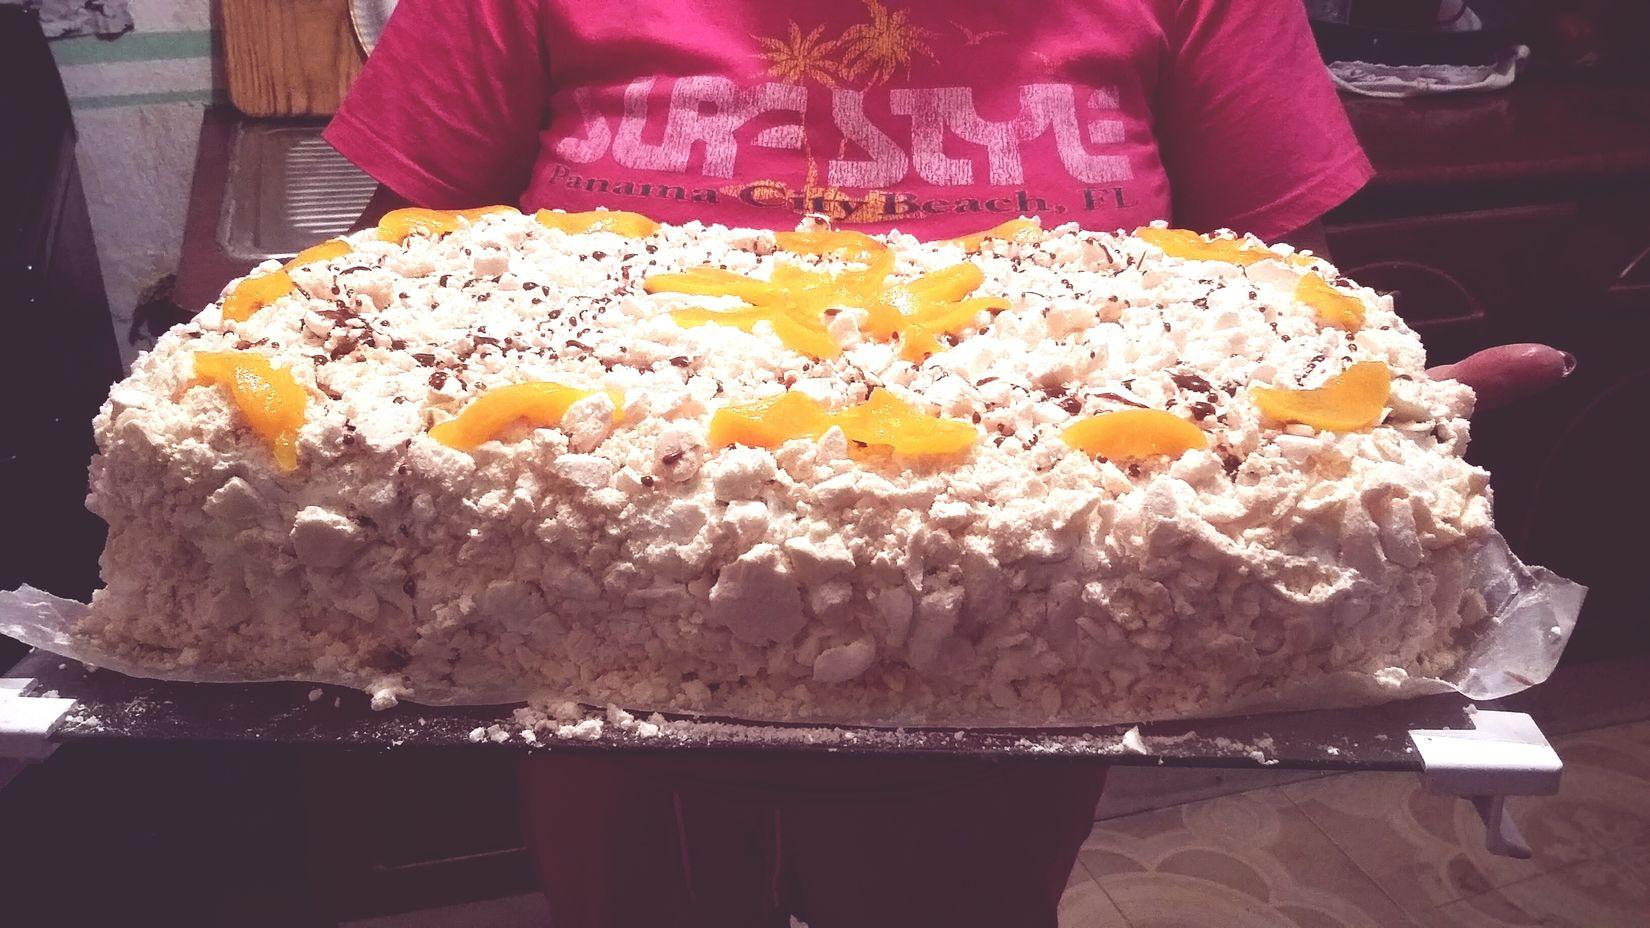 Que rico chaja 😍 Chaja Uruguay♥♥ Cake♥ Yummy♡ Traditionalfood